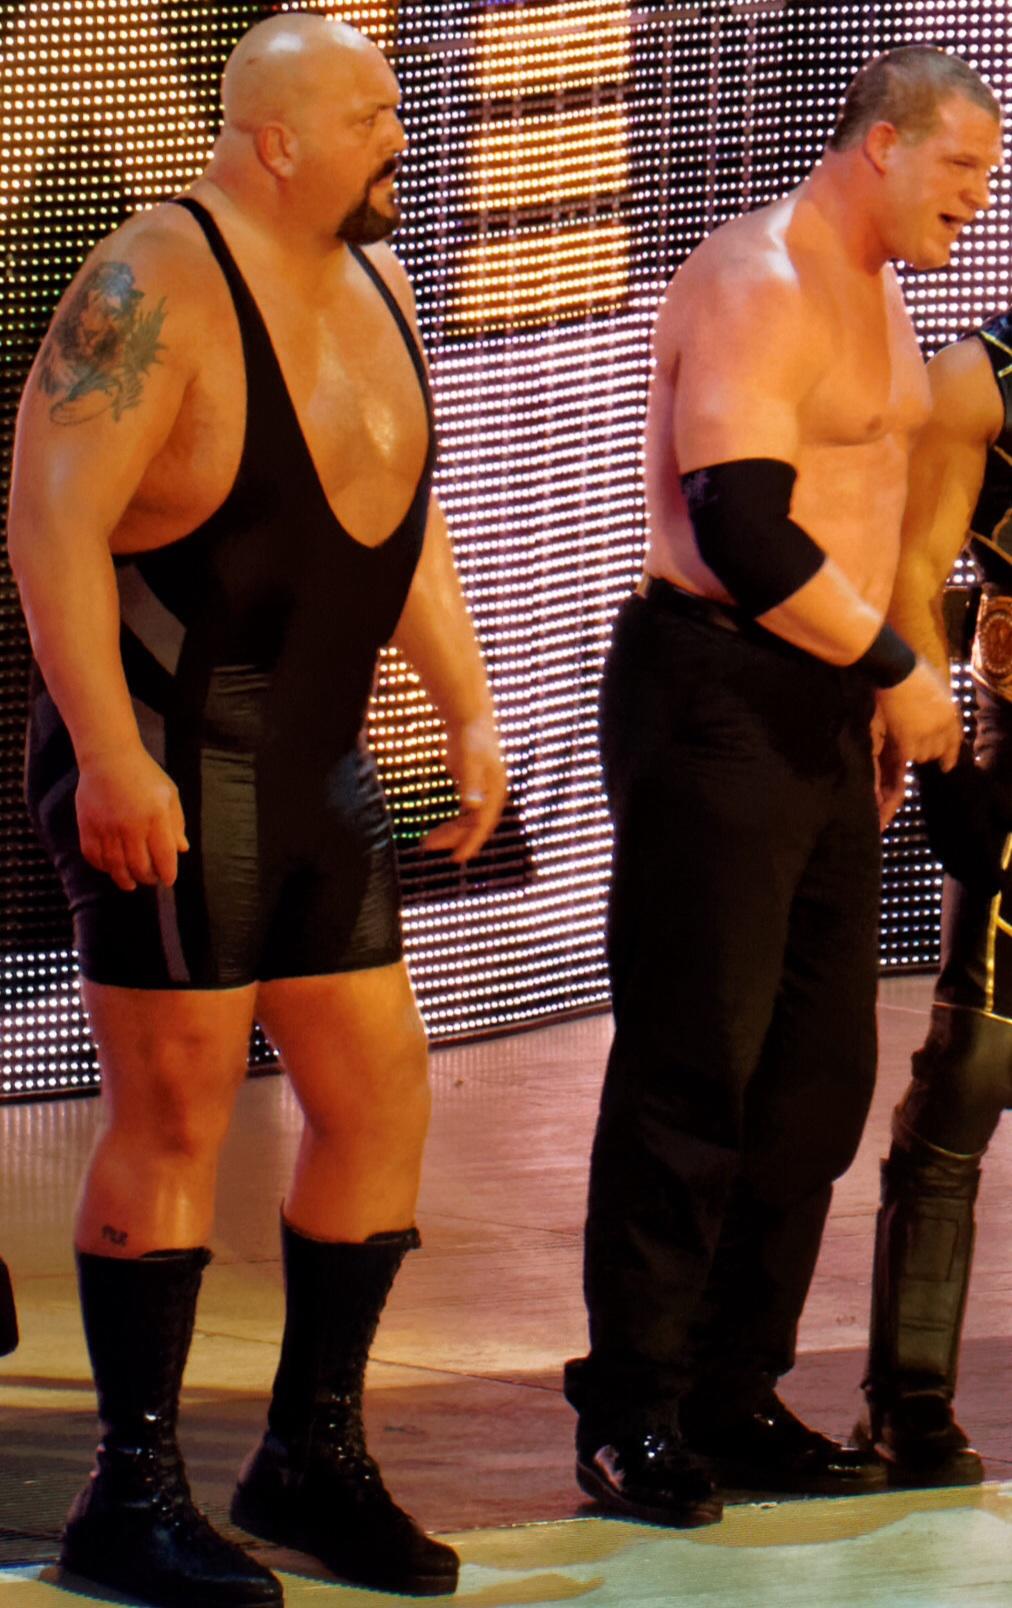 Big Show And Kane - Wikipedia